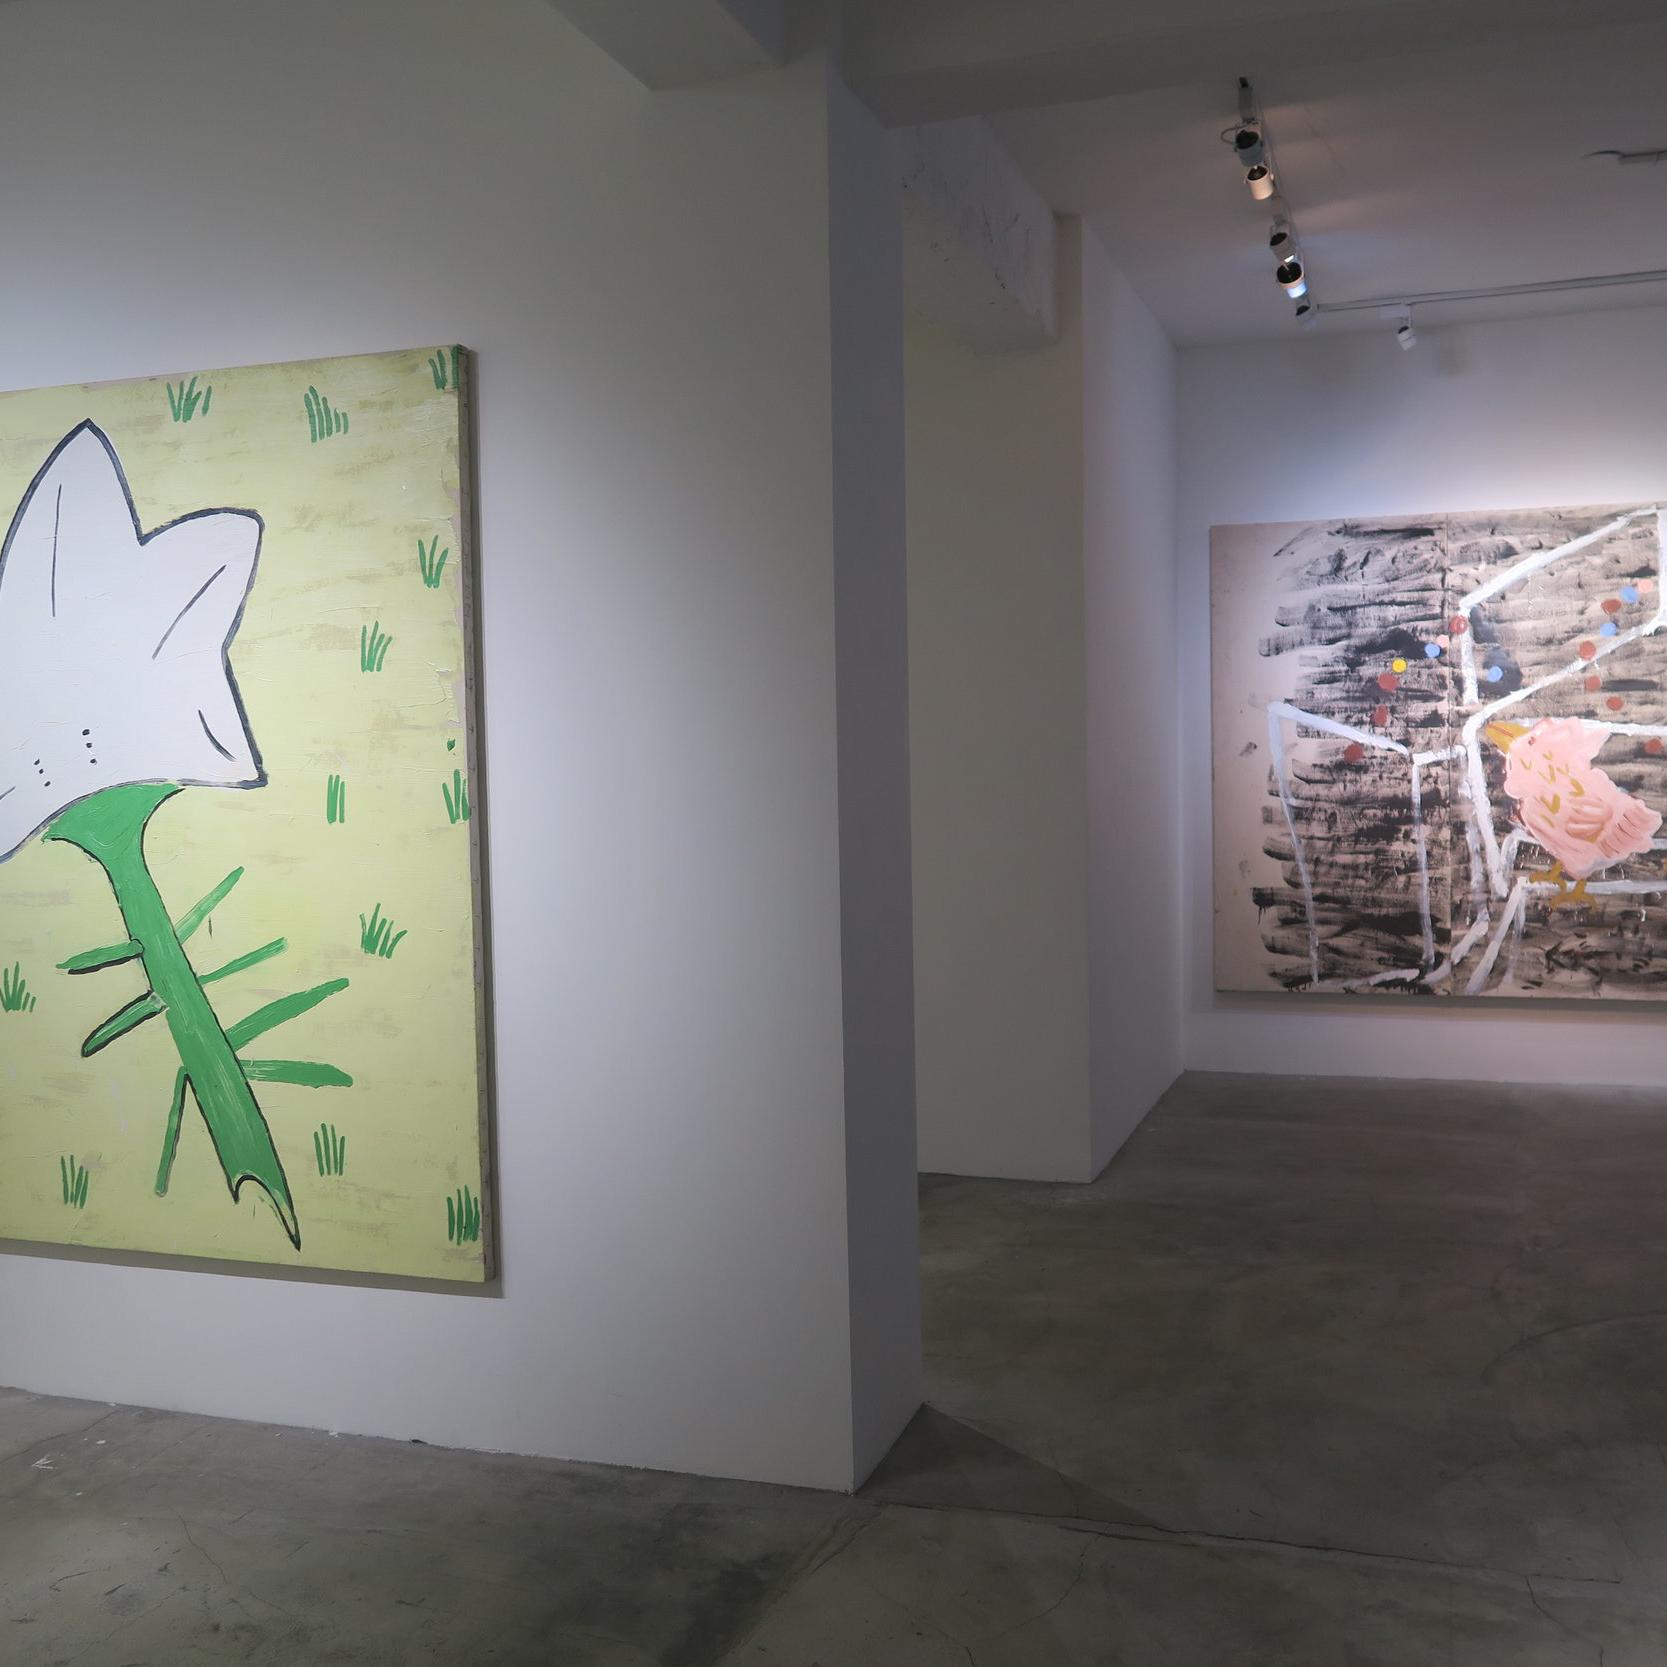 英國奶奶的烏托邦花園:蘿絲・薇莉個展  Rose Wylie: Yellow Bird and Leaves    2015.10.31—12.06